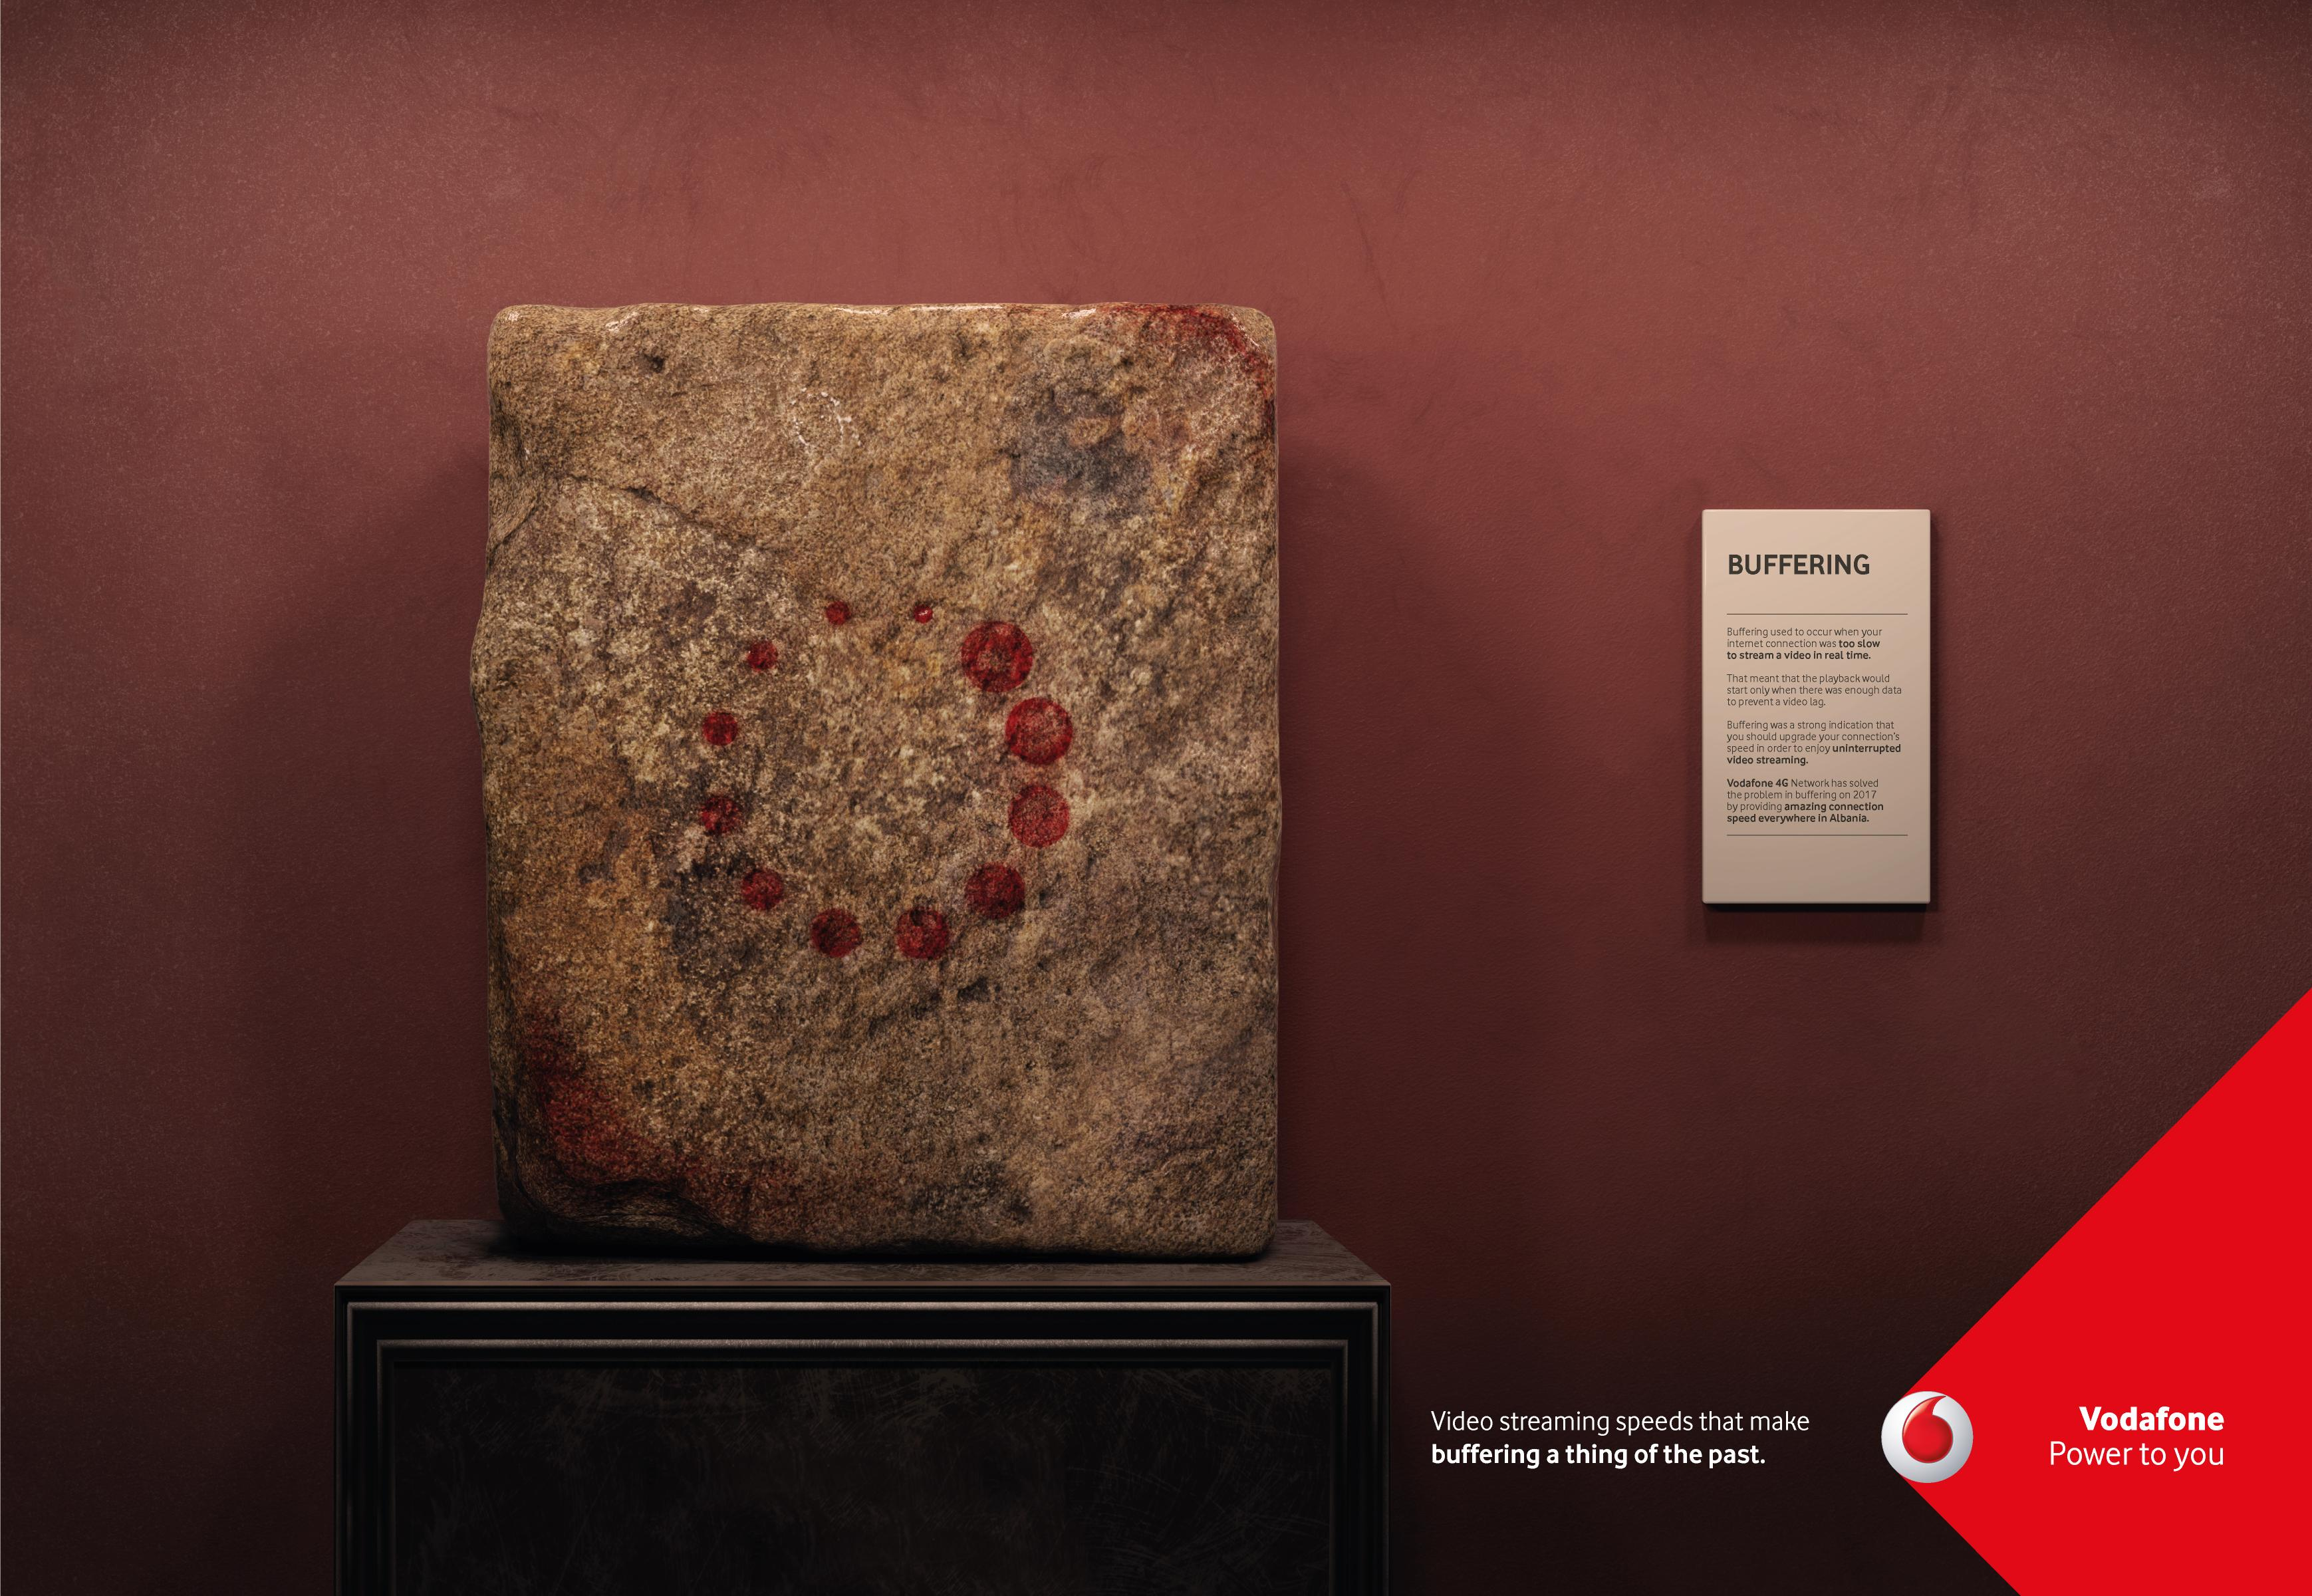 Vodafone Print Ad - Buffering, 2